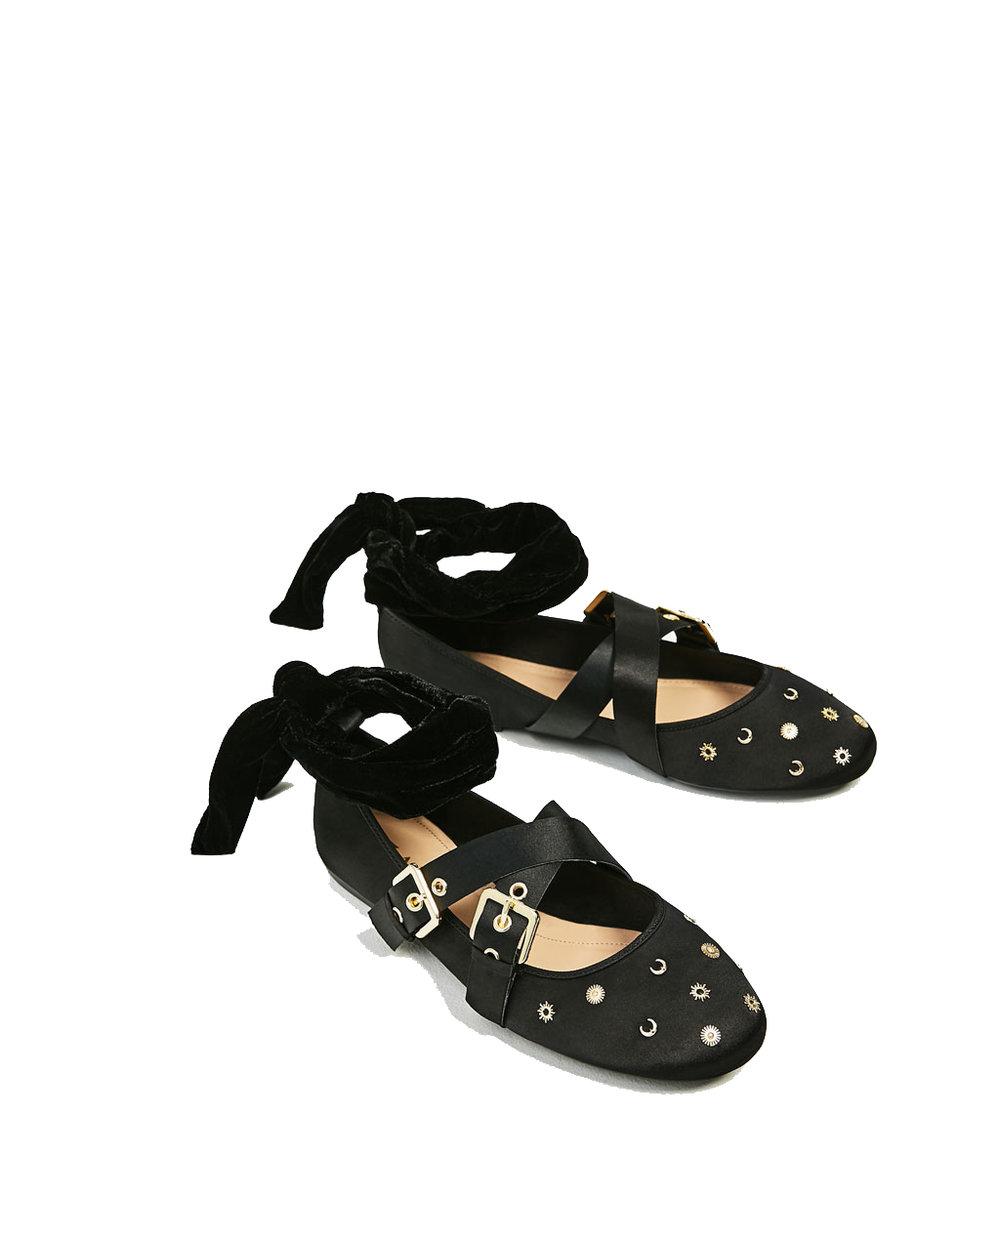 Zara Ballerina Flats - $39.90